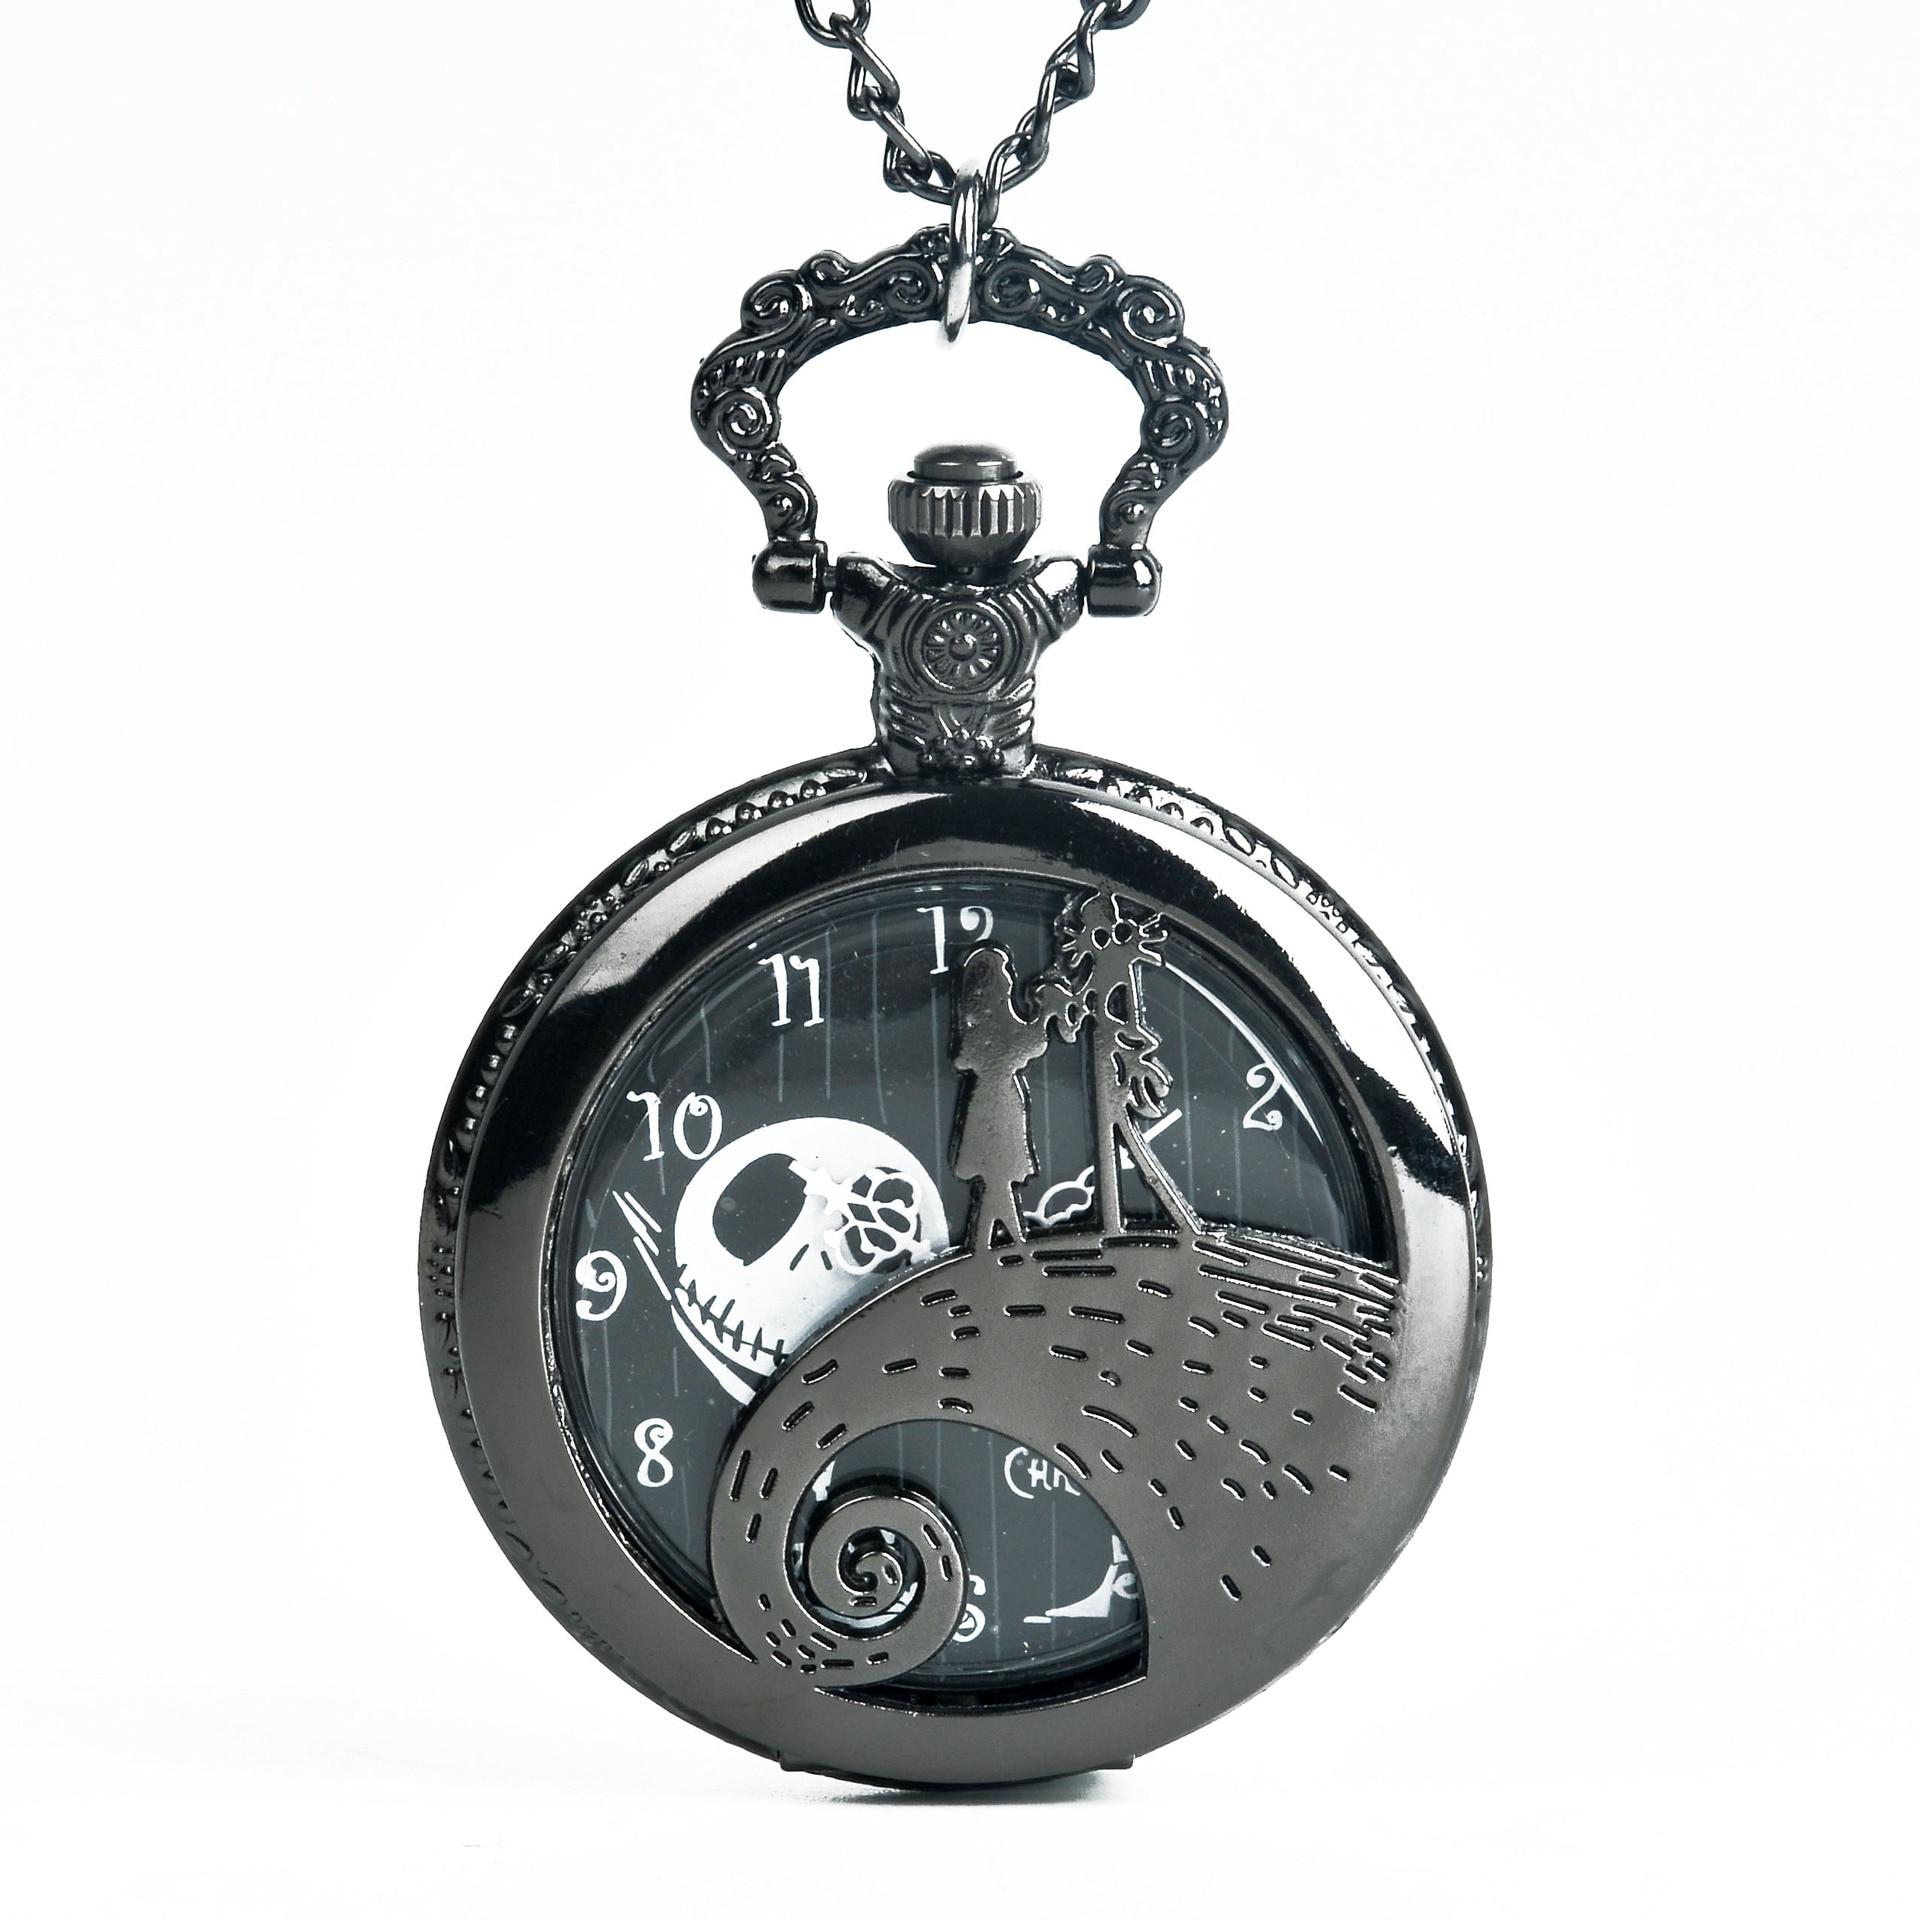 9003Silver/Black/Bronze The Nightmare Before Christmas Pocket Watch Jack Skellington Tim Burton Movie Kid Pendant Necklace Clock